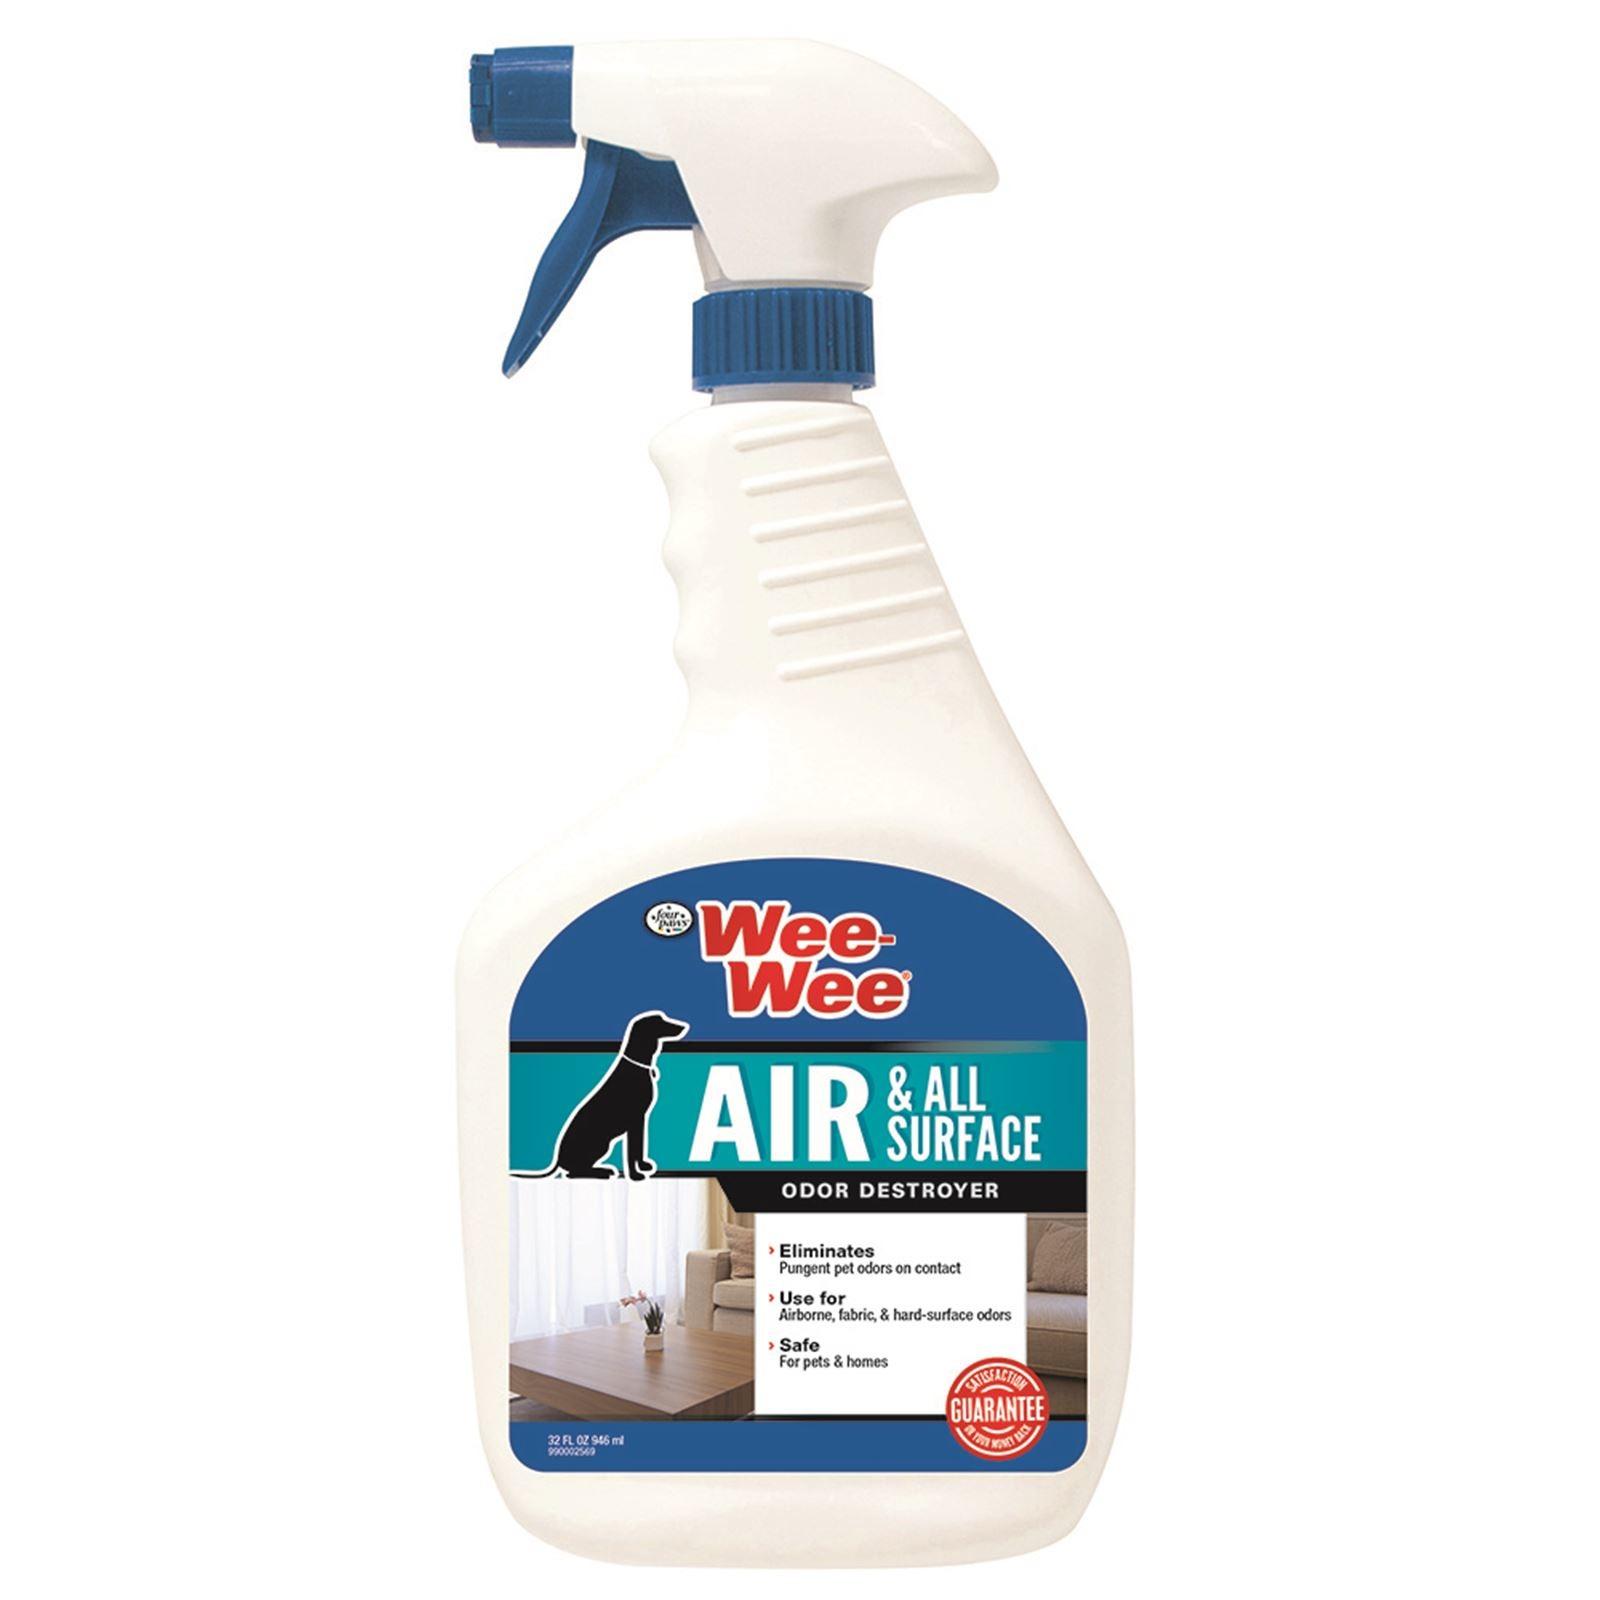 Four Paws Air & All Surface Odor